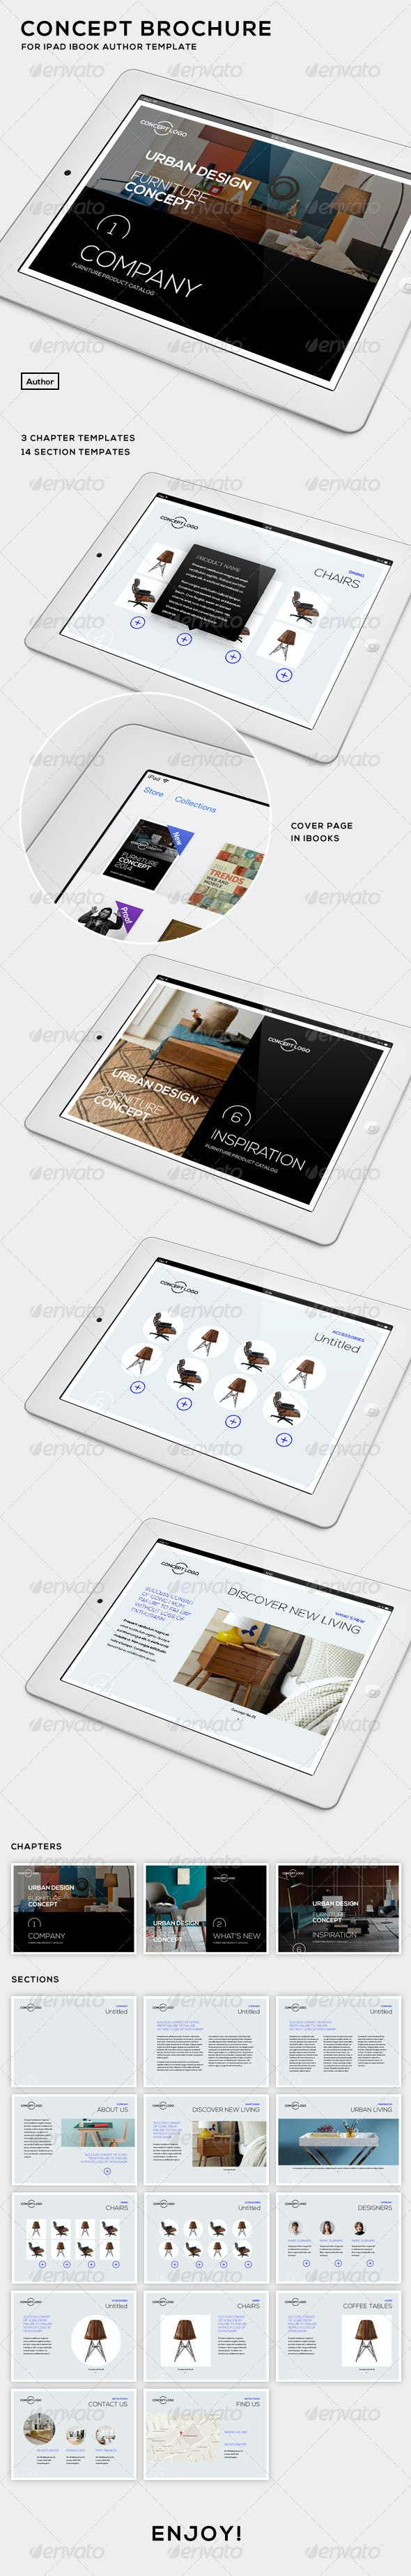 Concept Brochure for iPad - iBooks Author Template - ePublishing